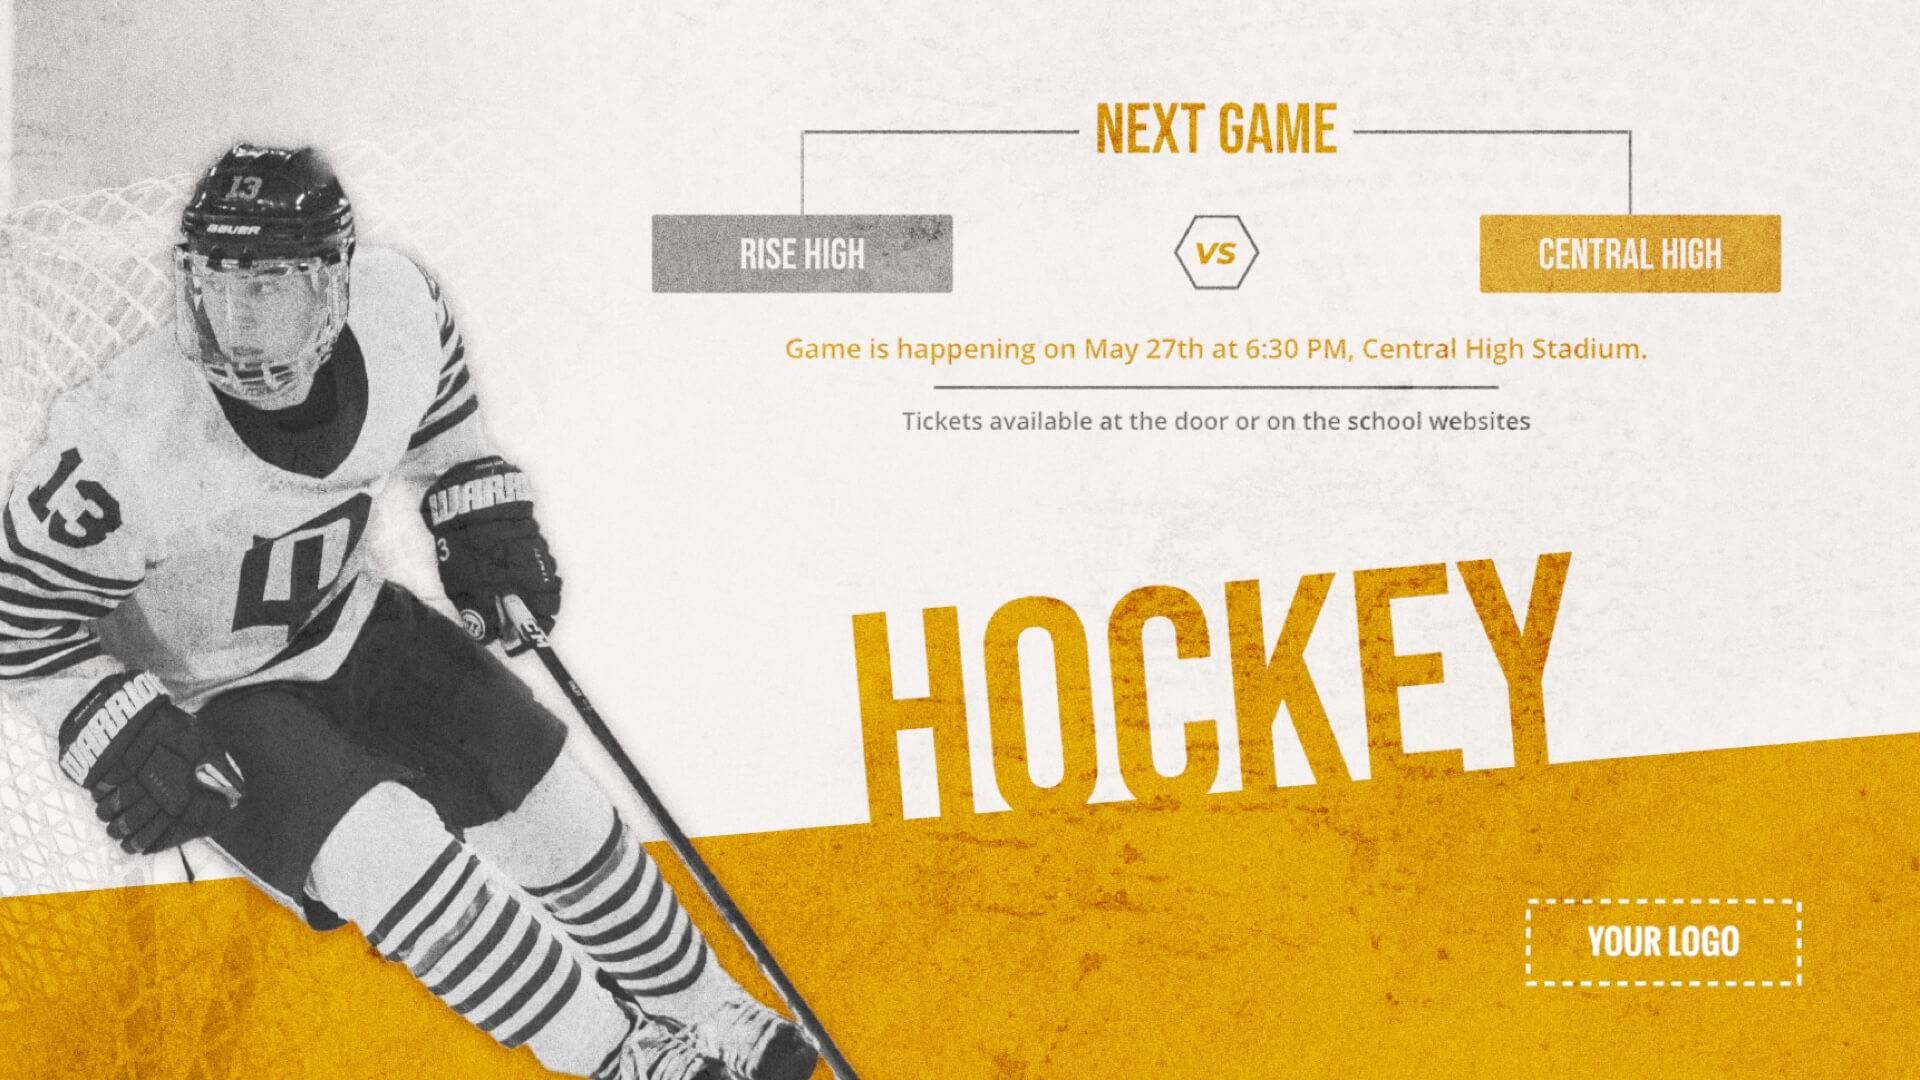 Hockey Game - Sports Digital Signage Template